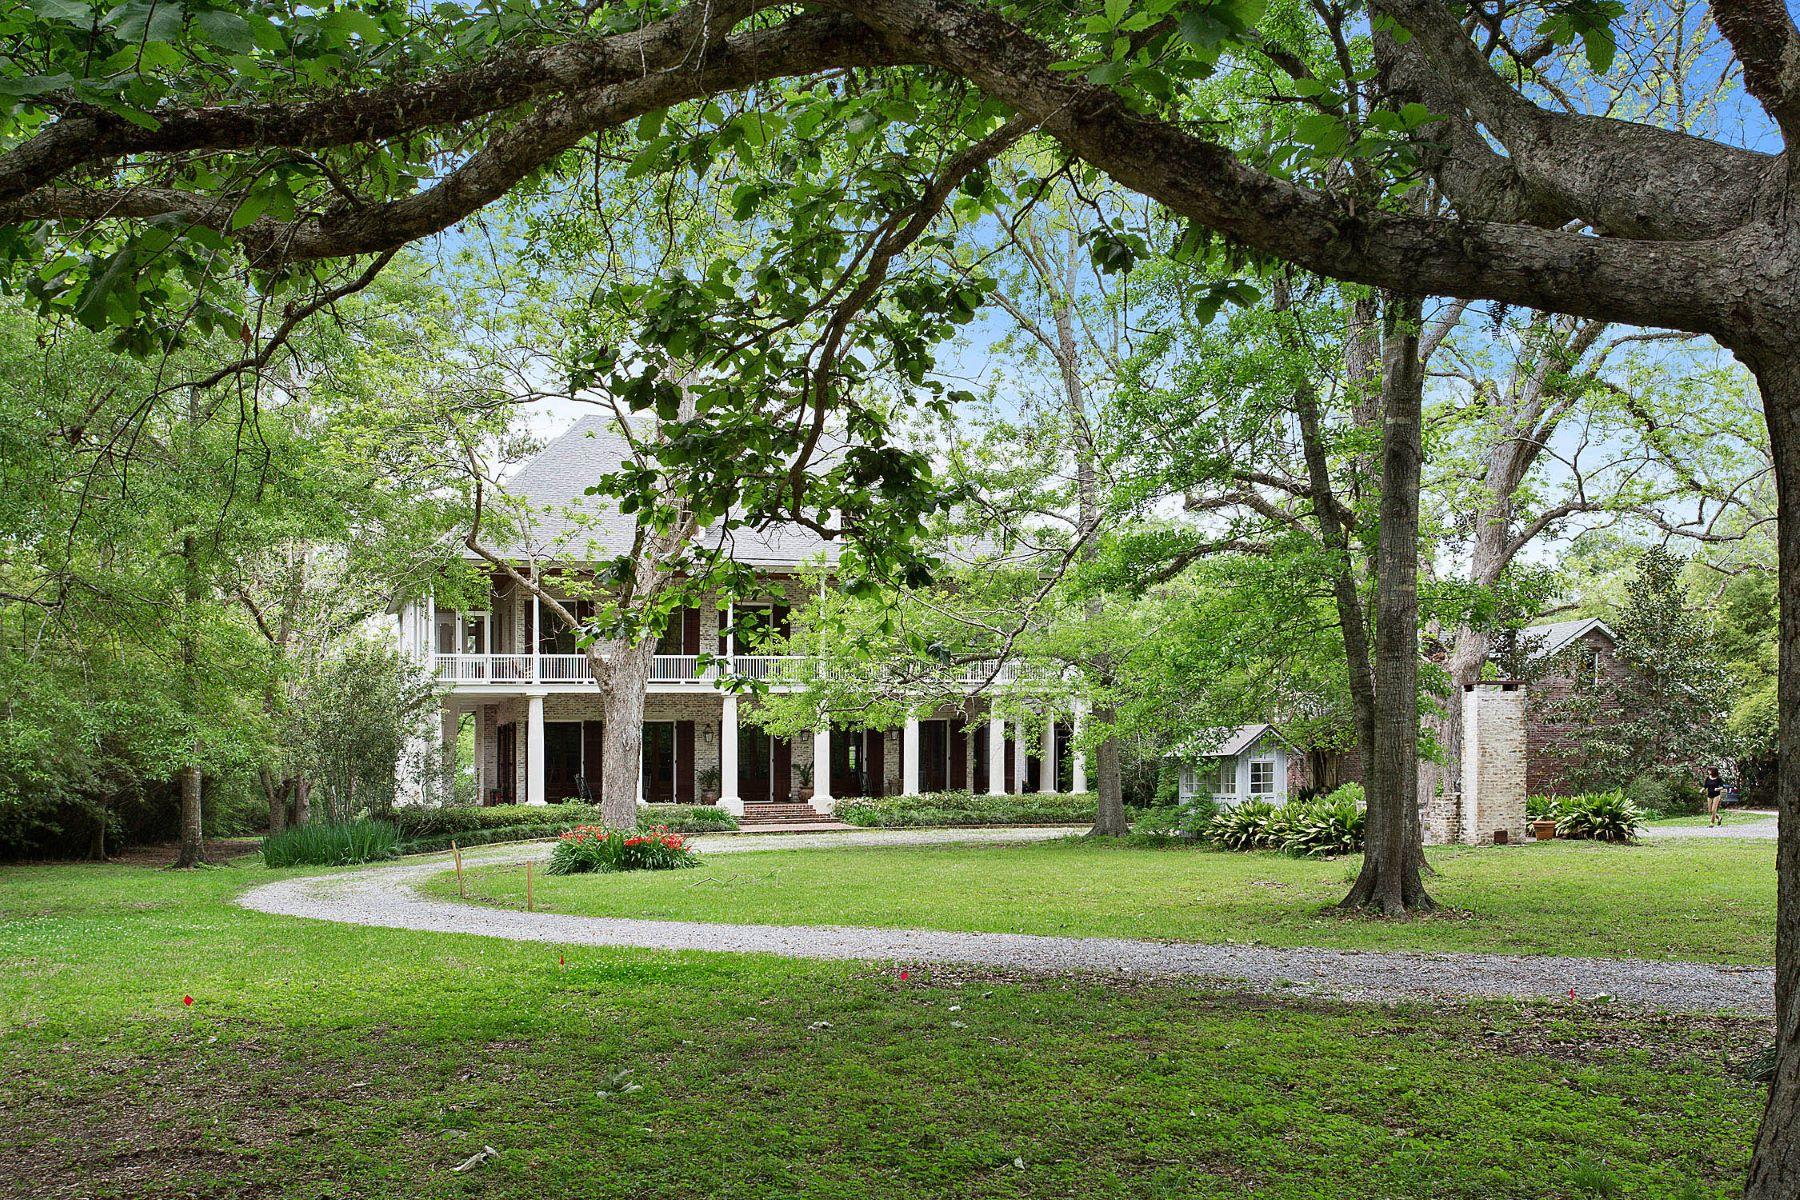 Single Family Home for Sale at 138 Deloaks Road Madisonville, Louisiana 70447 United States